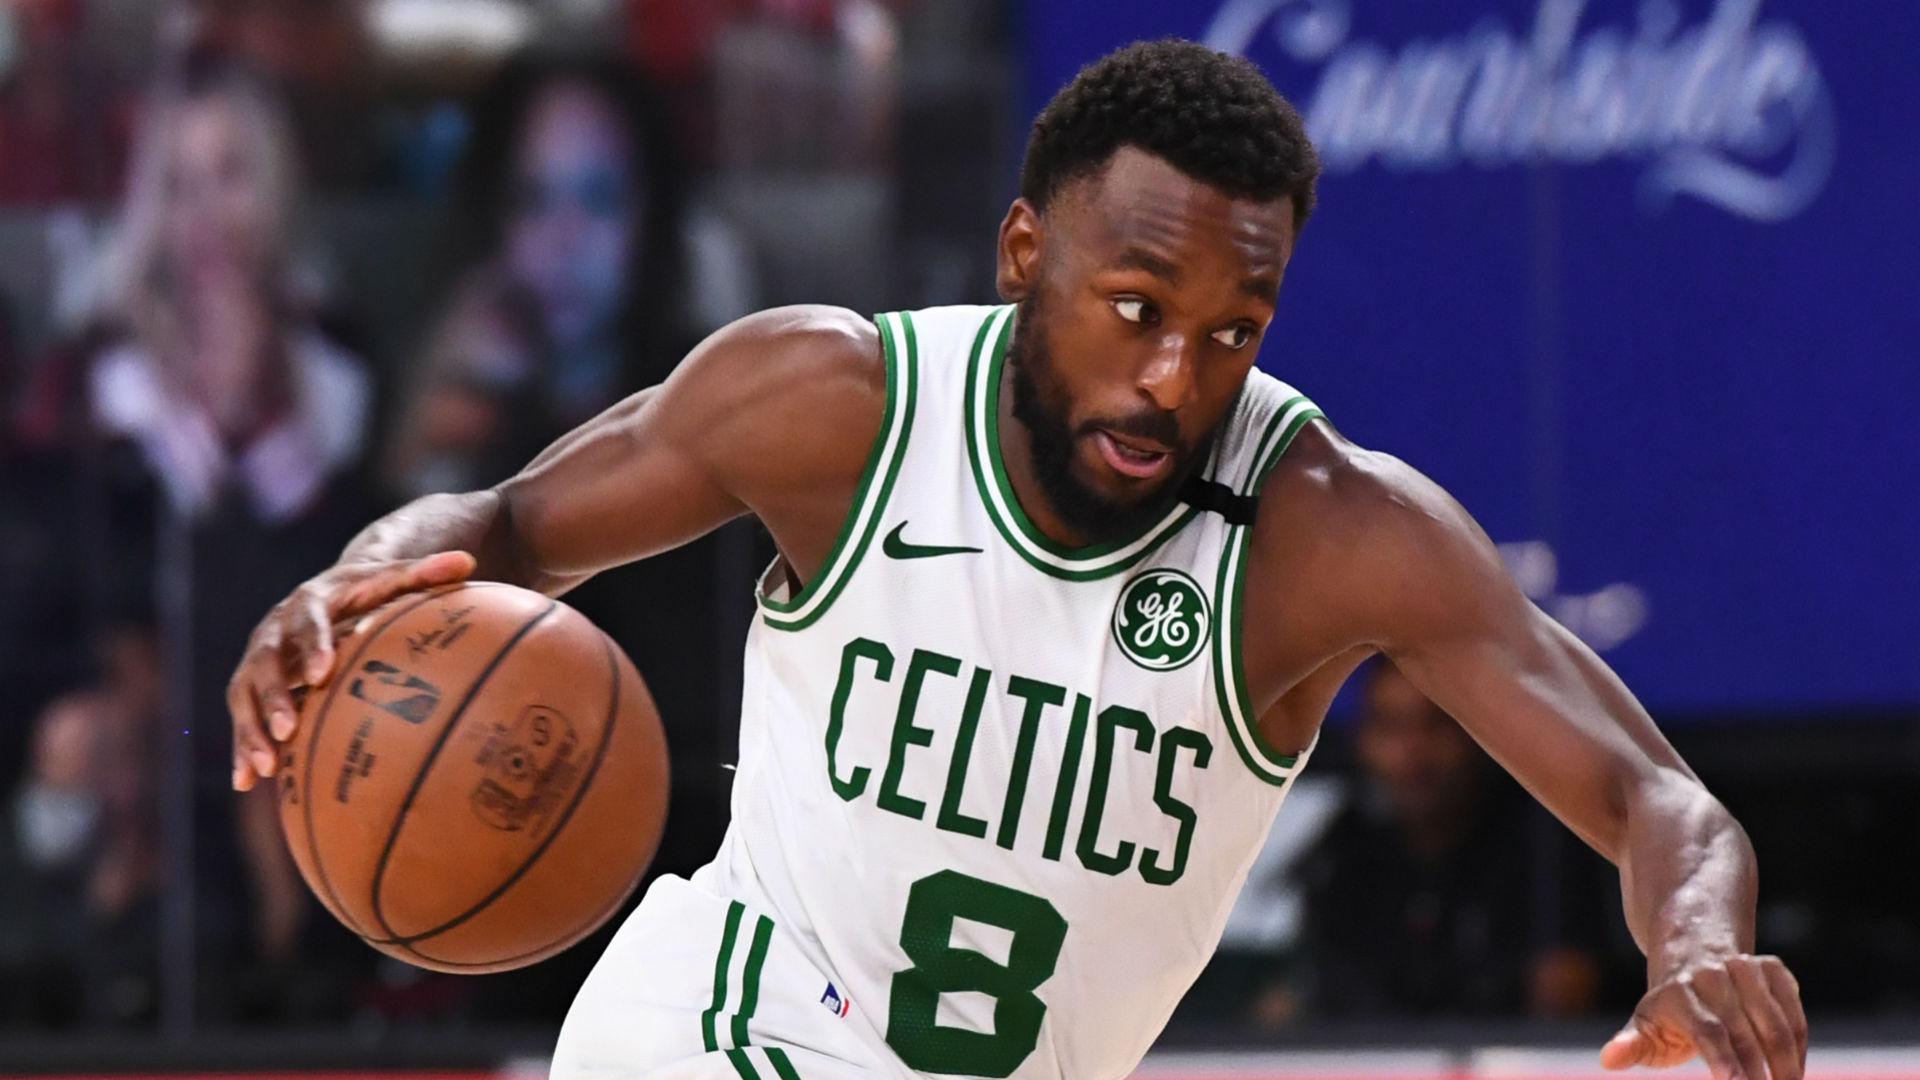 Celtics guard Walker set to miss start of NBA season